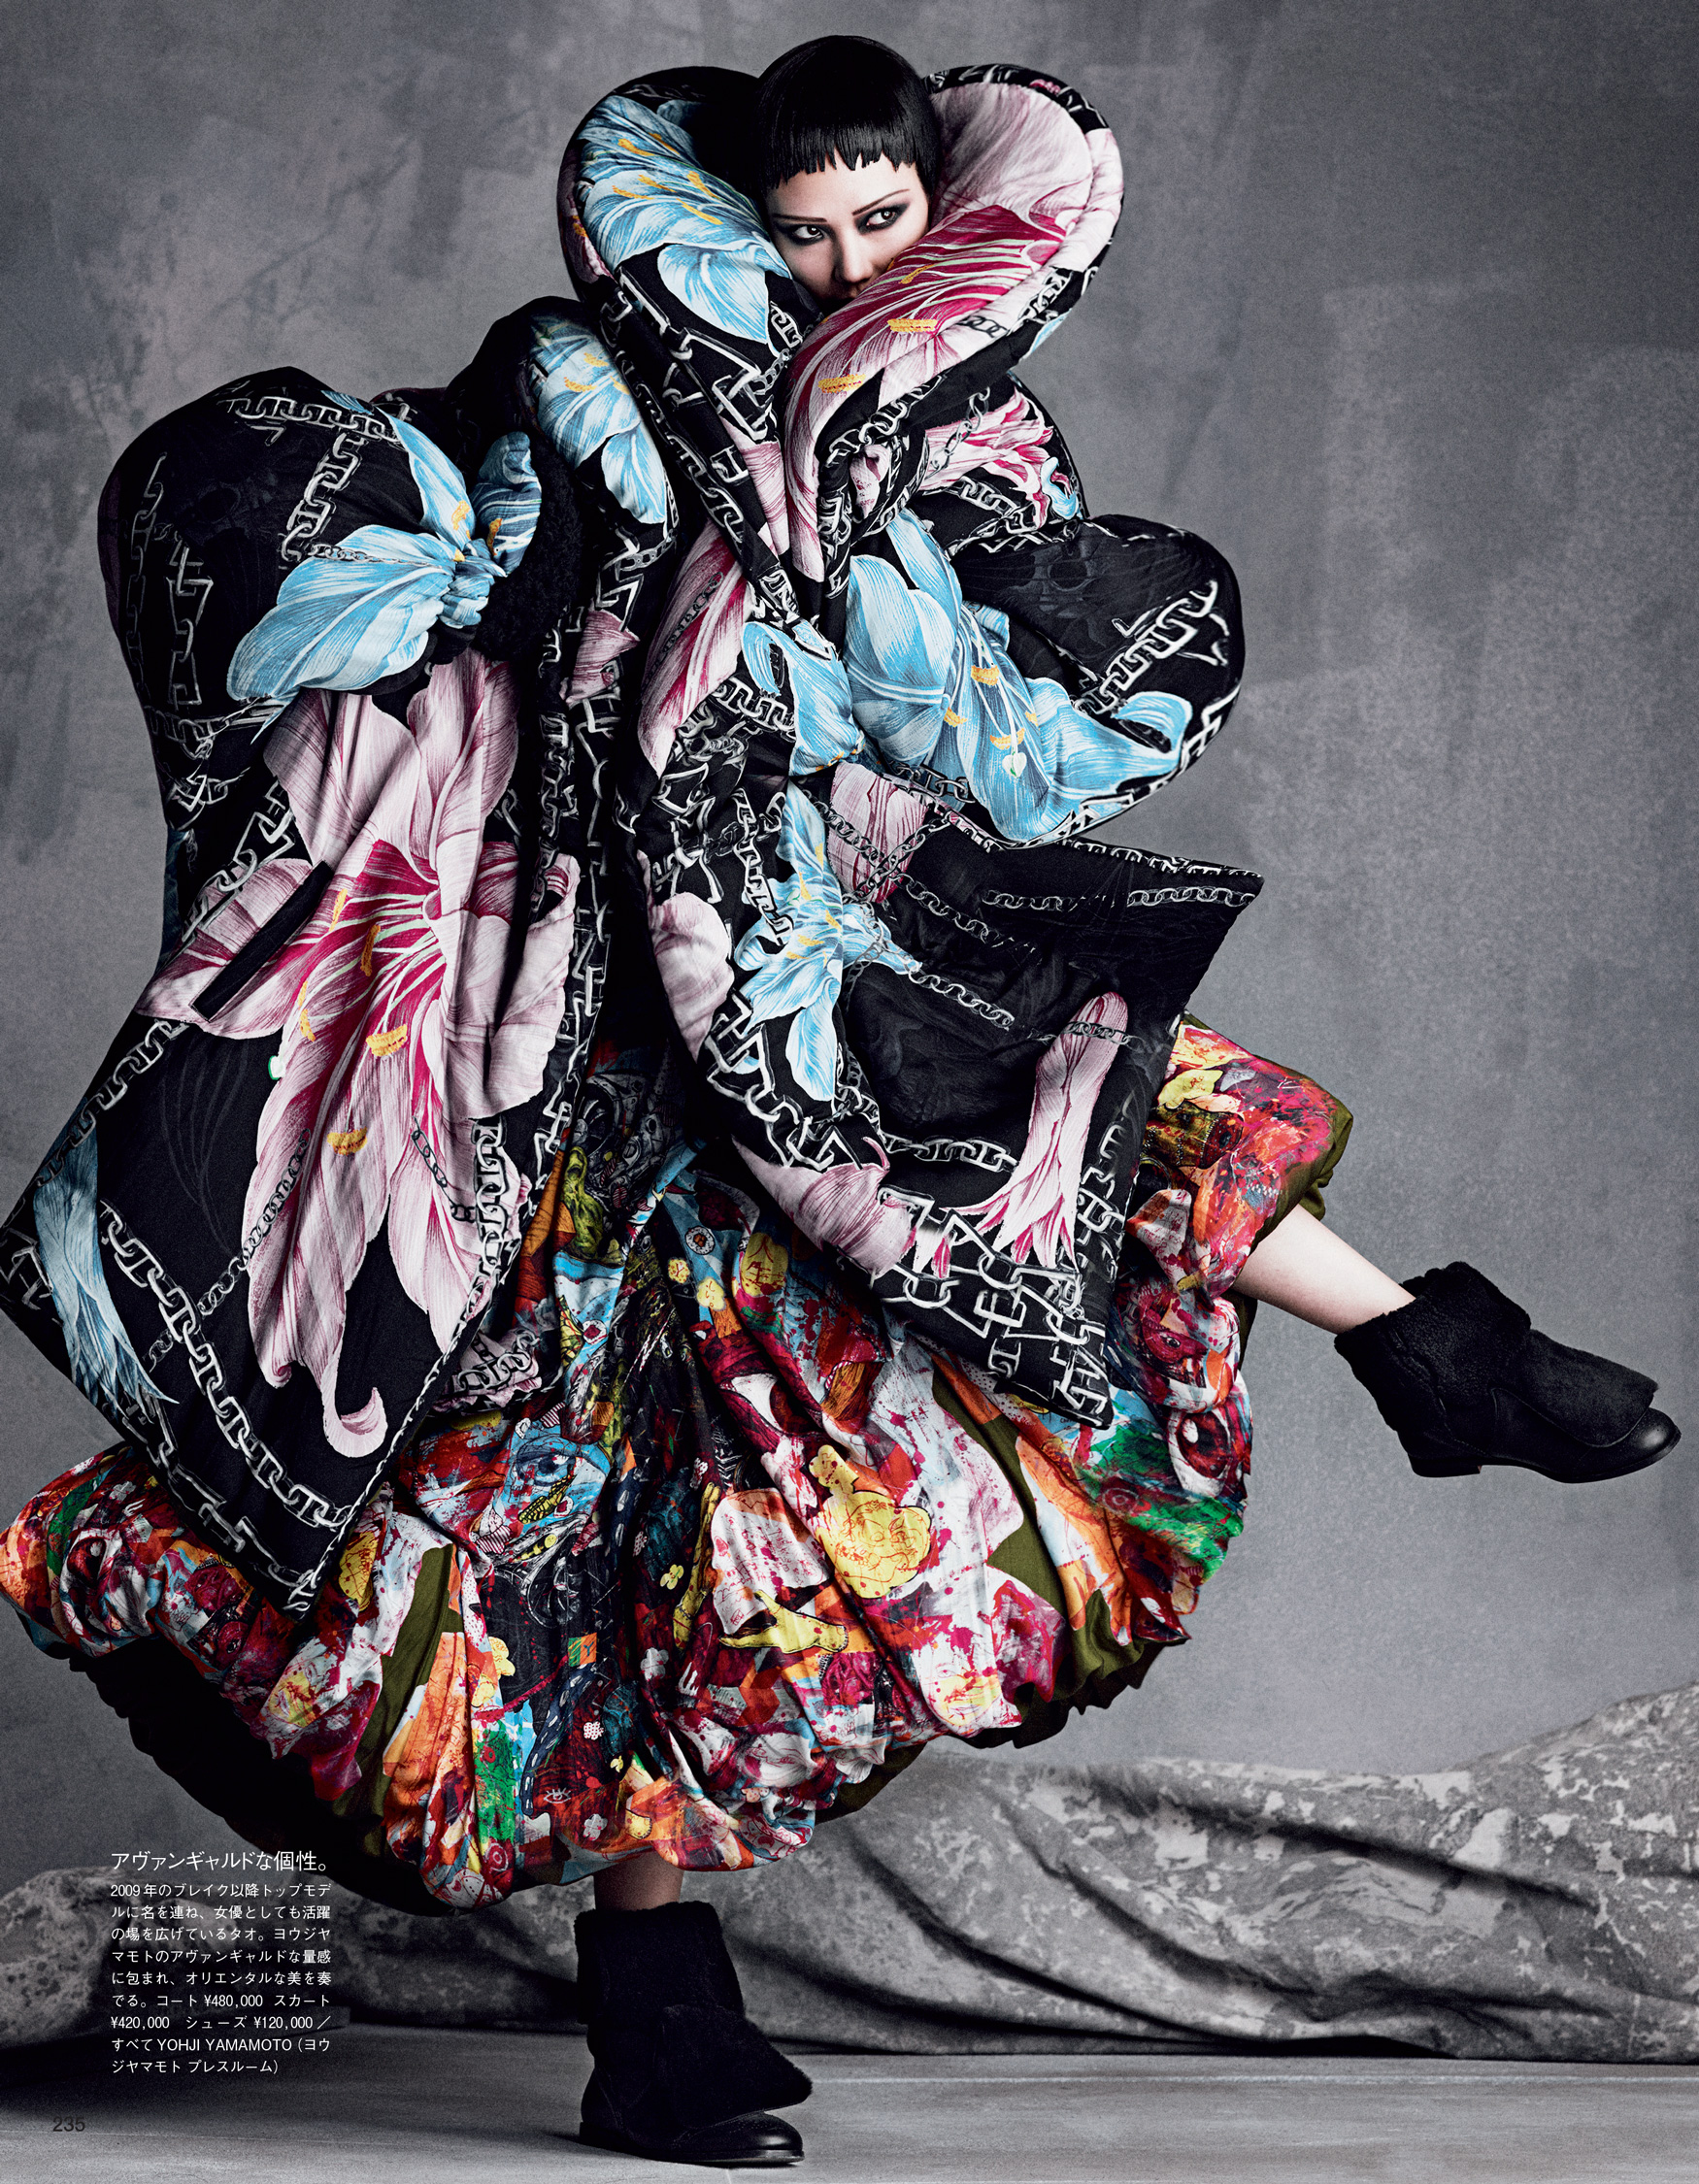 Giovanna-Battaglia-The-Icons-Of-Perfections-Vogue-Japan-15th-Anniversary-Issue-Luigi-Iango-3.jpg